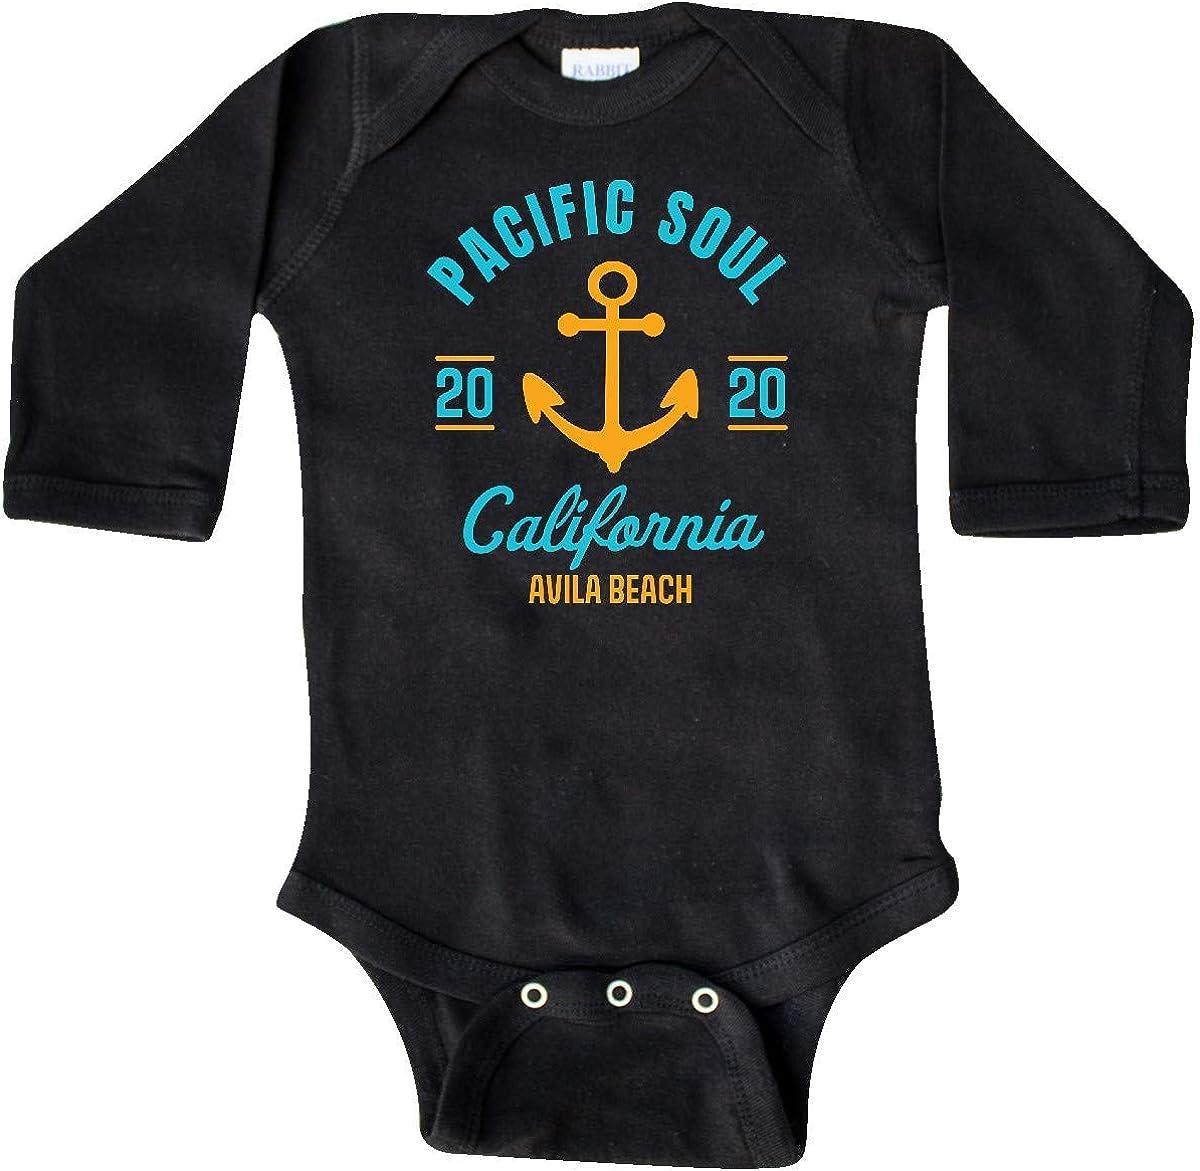 inktastic Pacific Soul California Avila Beach 2020 with Long Sleeve Creeper